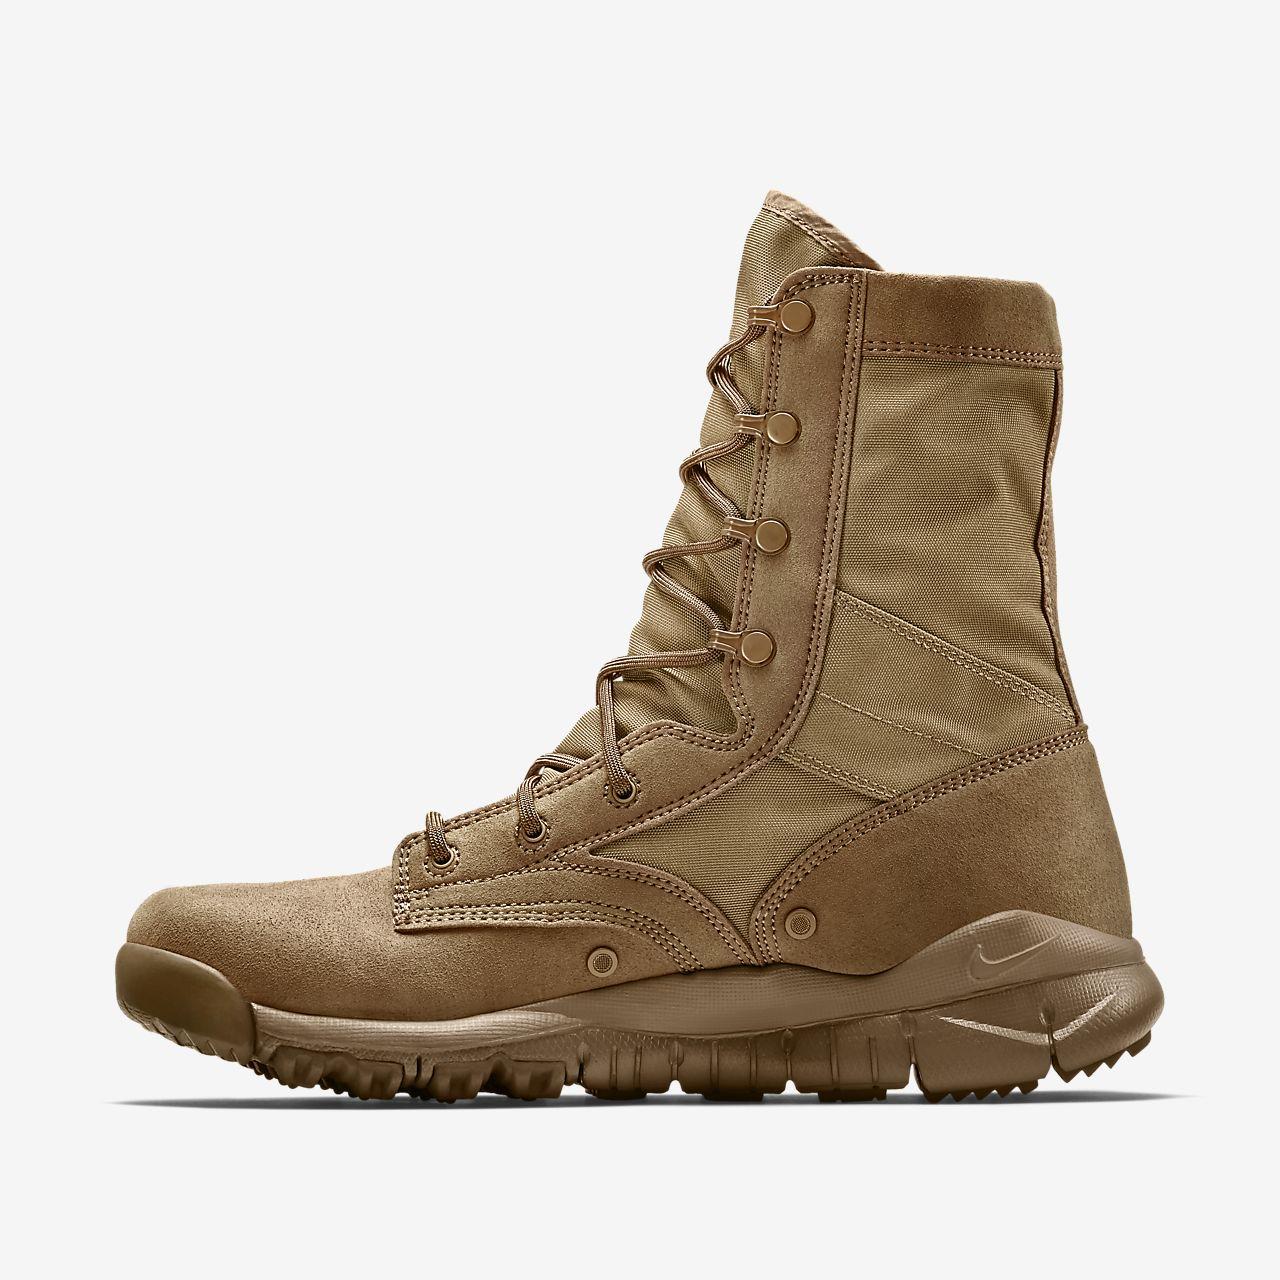 ... Nike Special Field Men's Boot